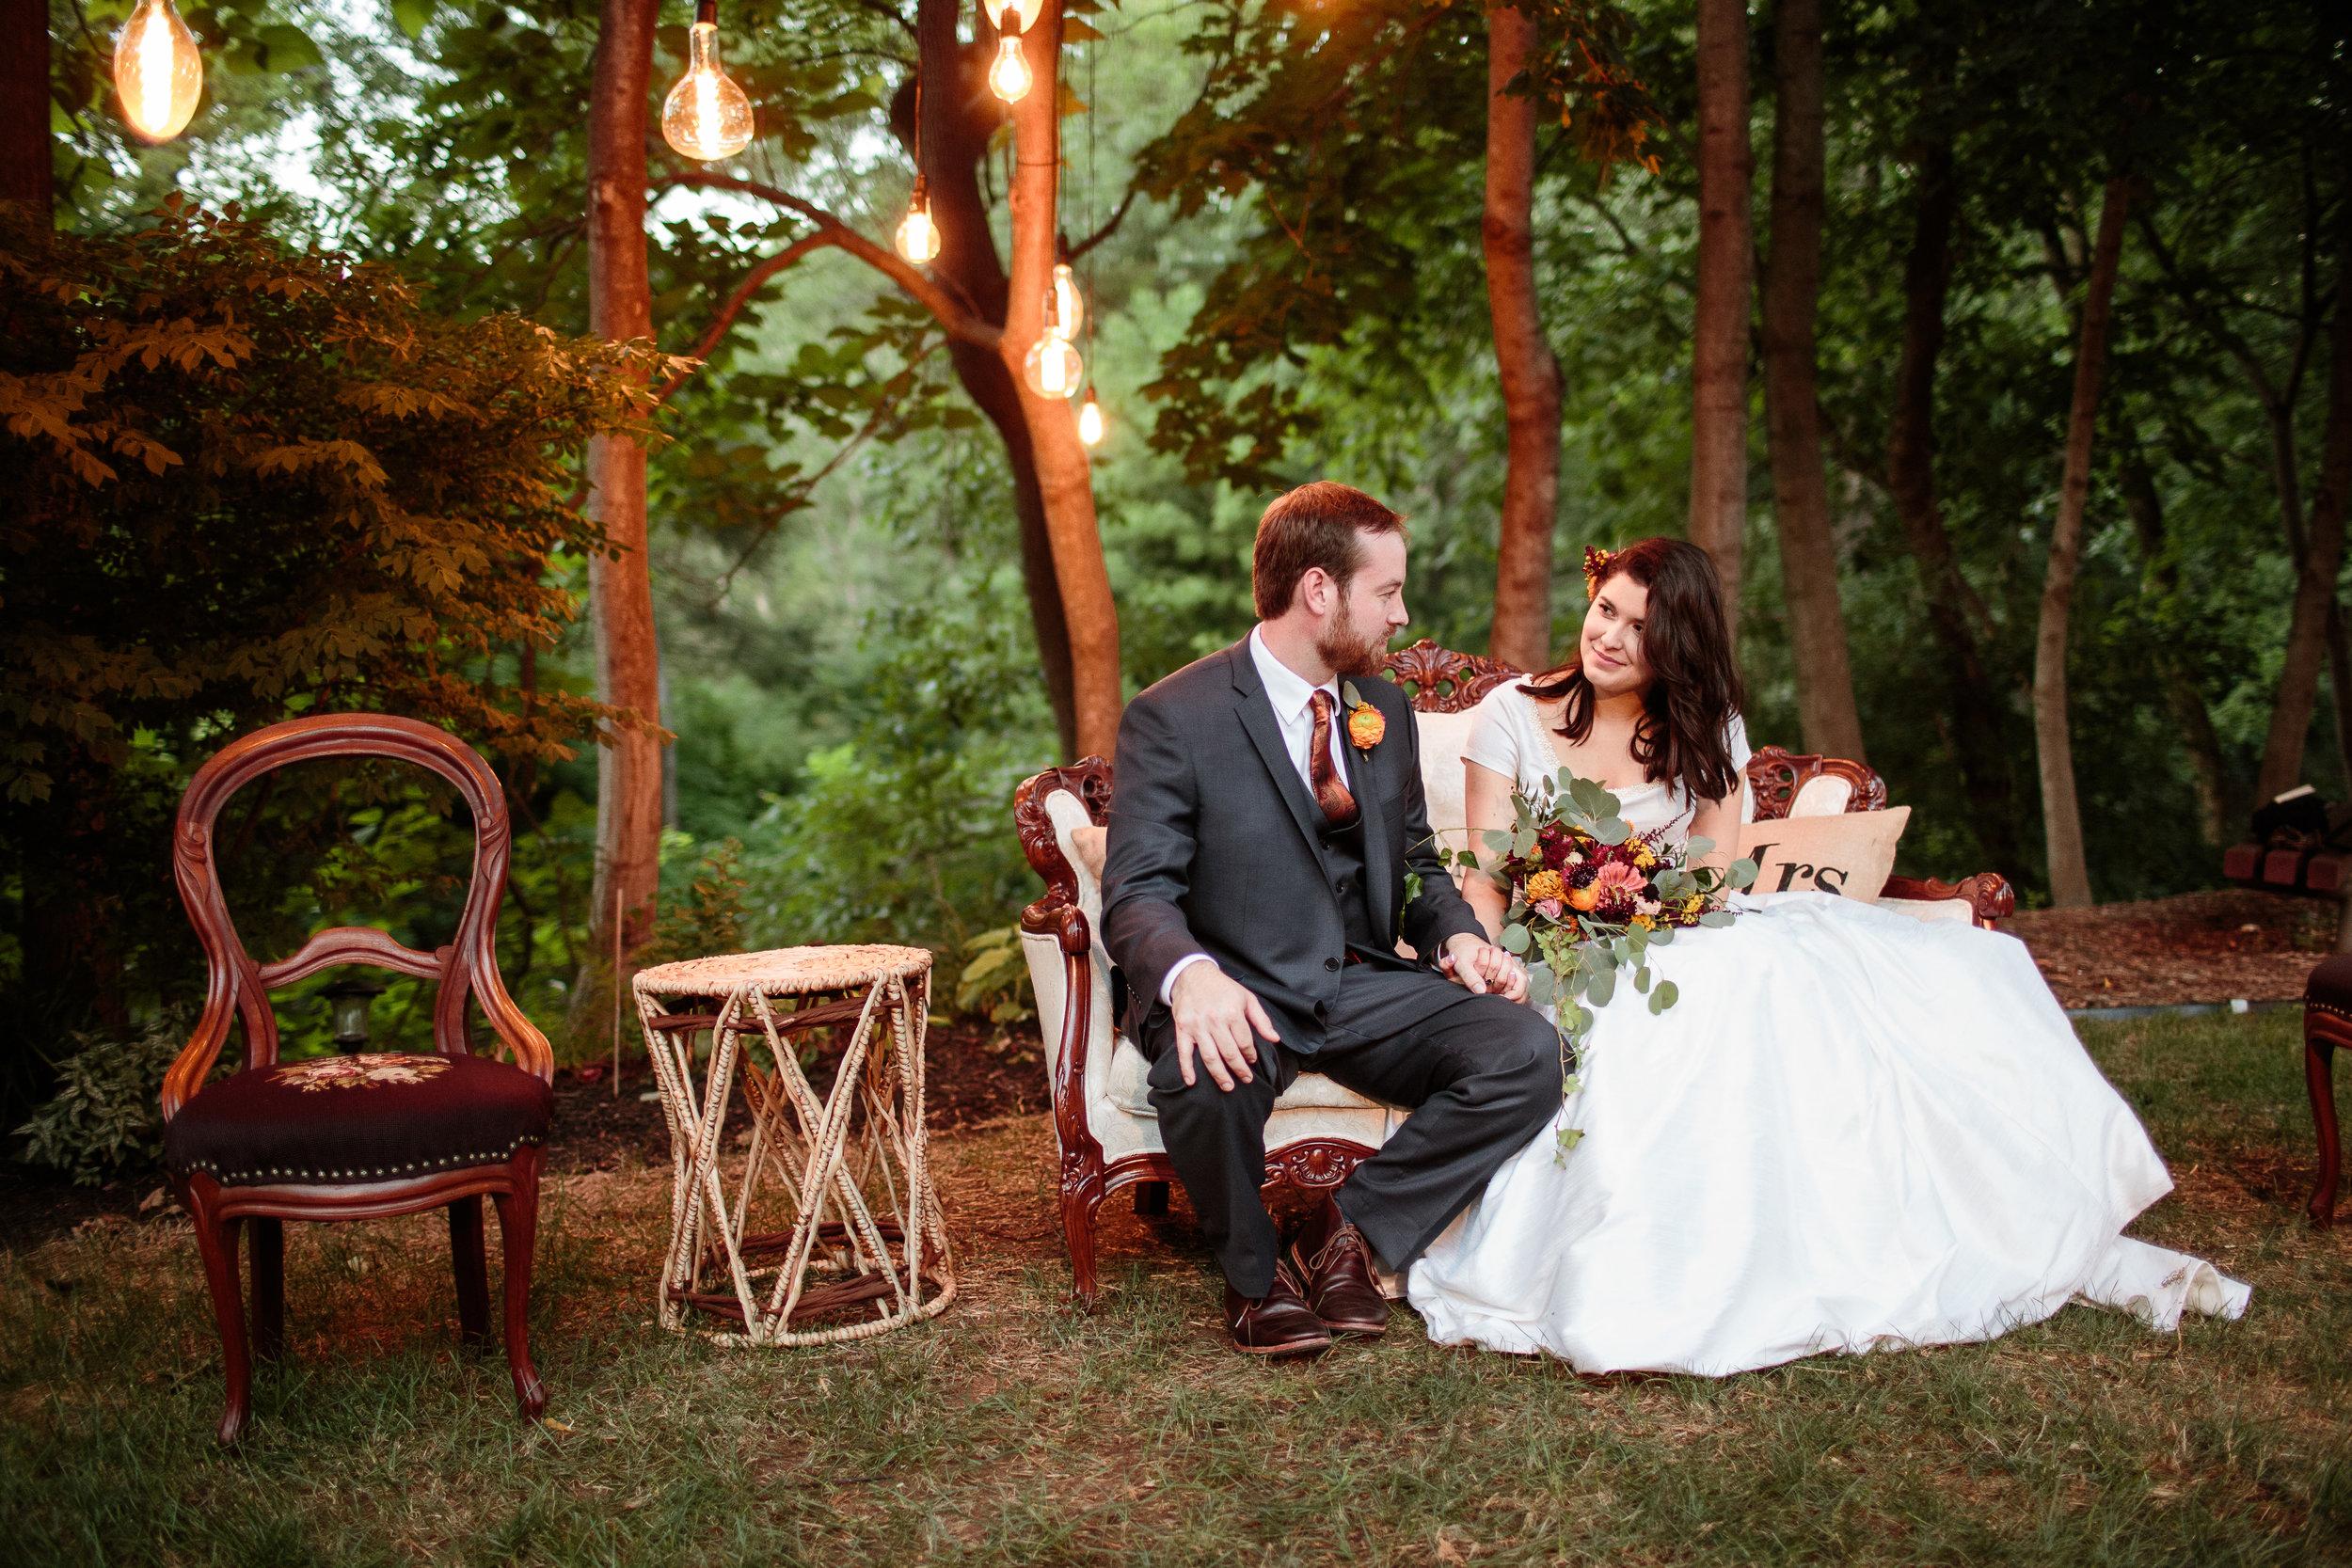 Mallory-Taylor-Wedding-HIGHRESOLUTION-8.jpg